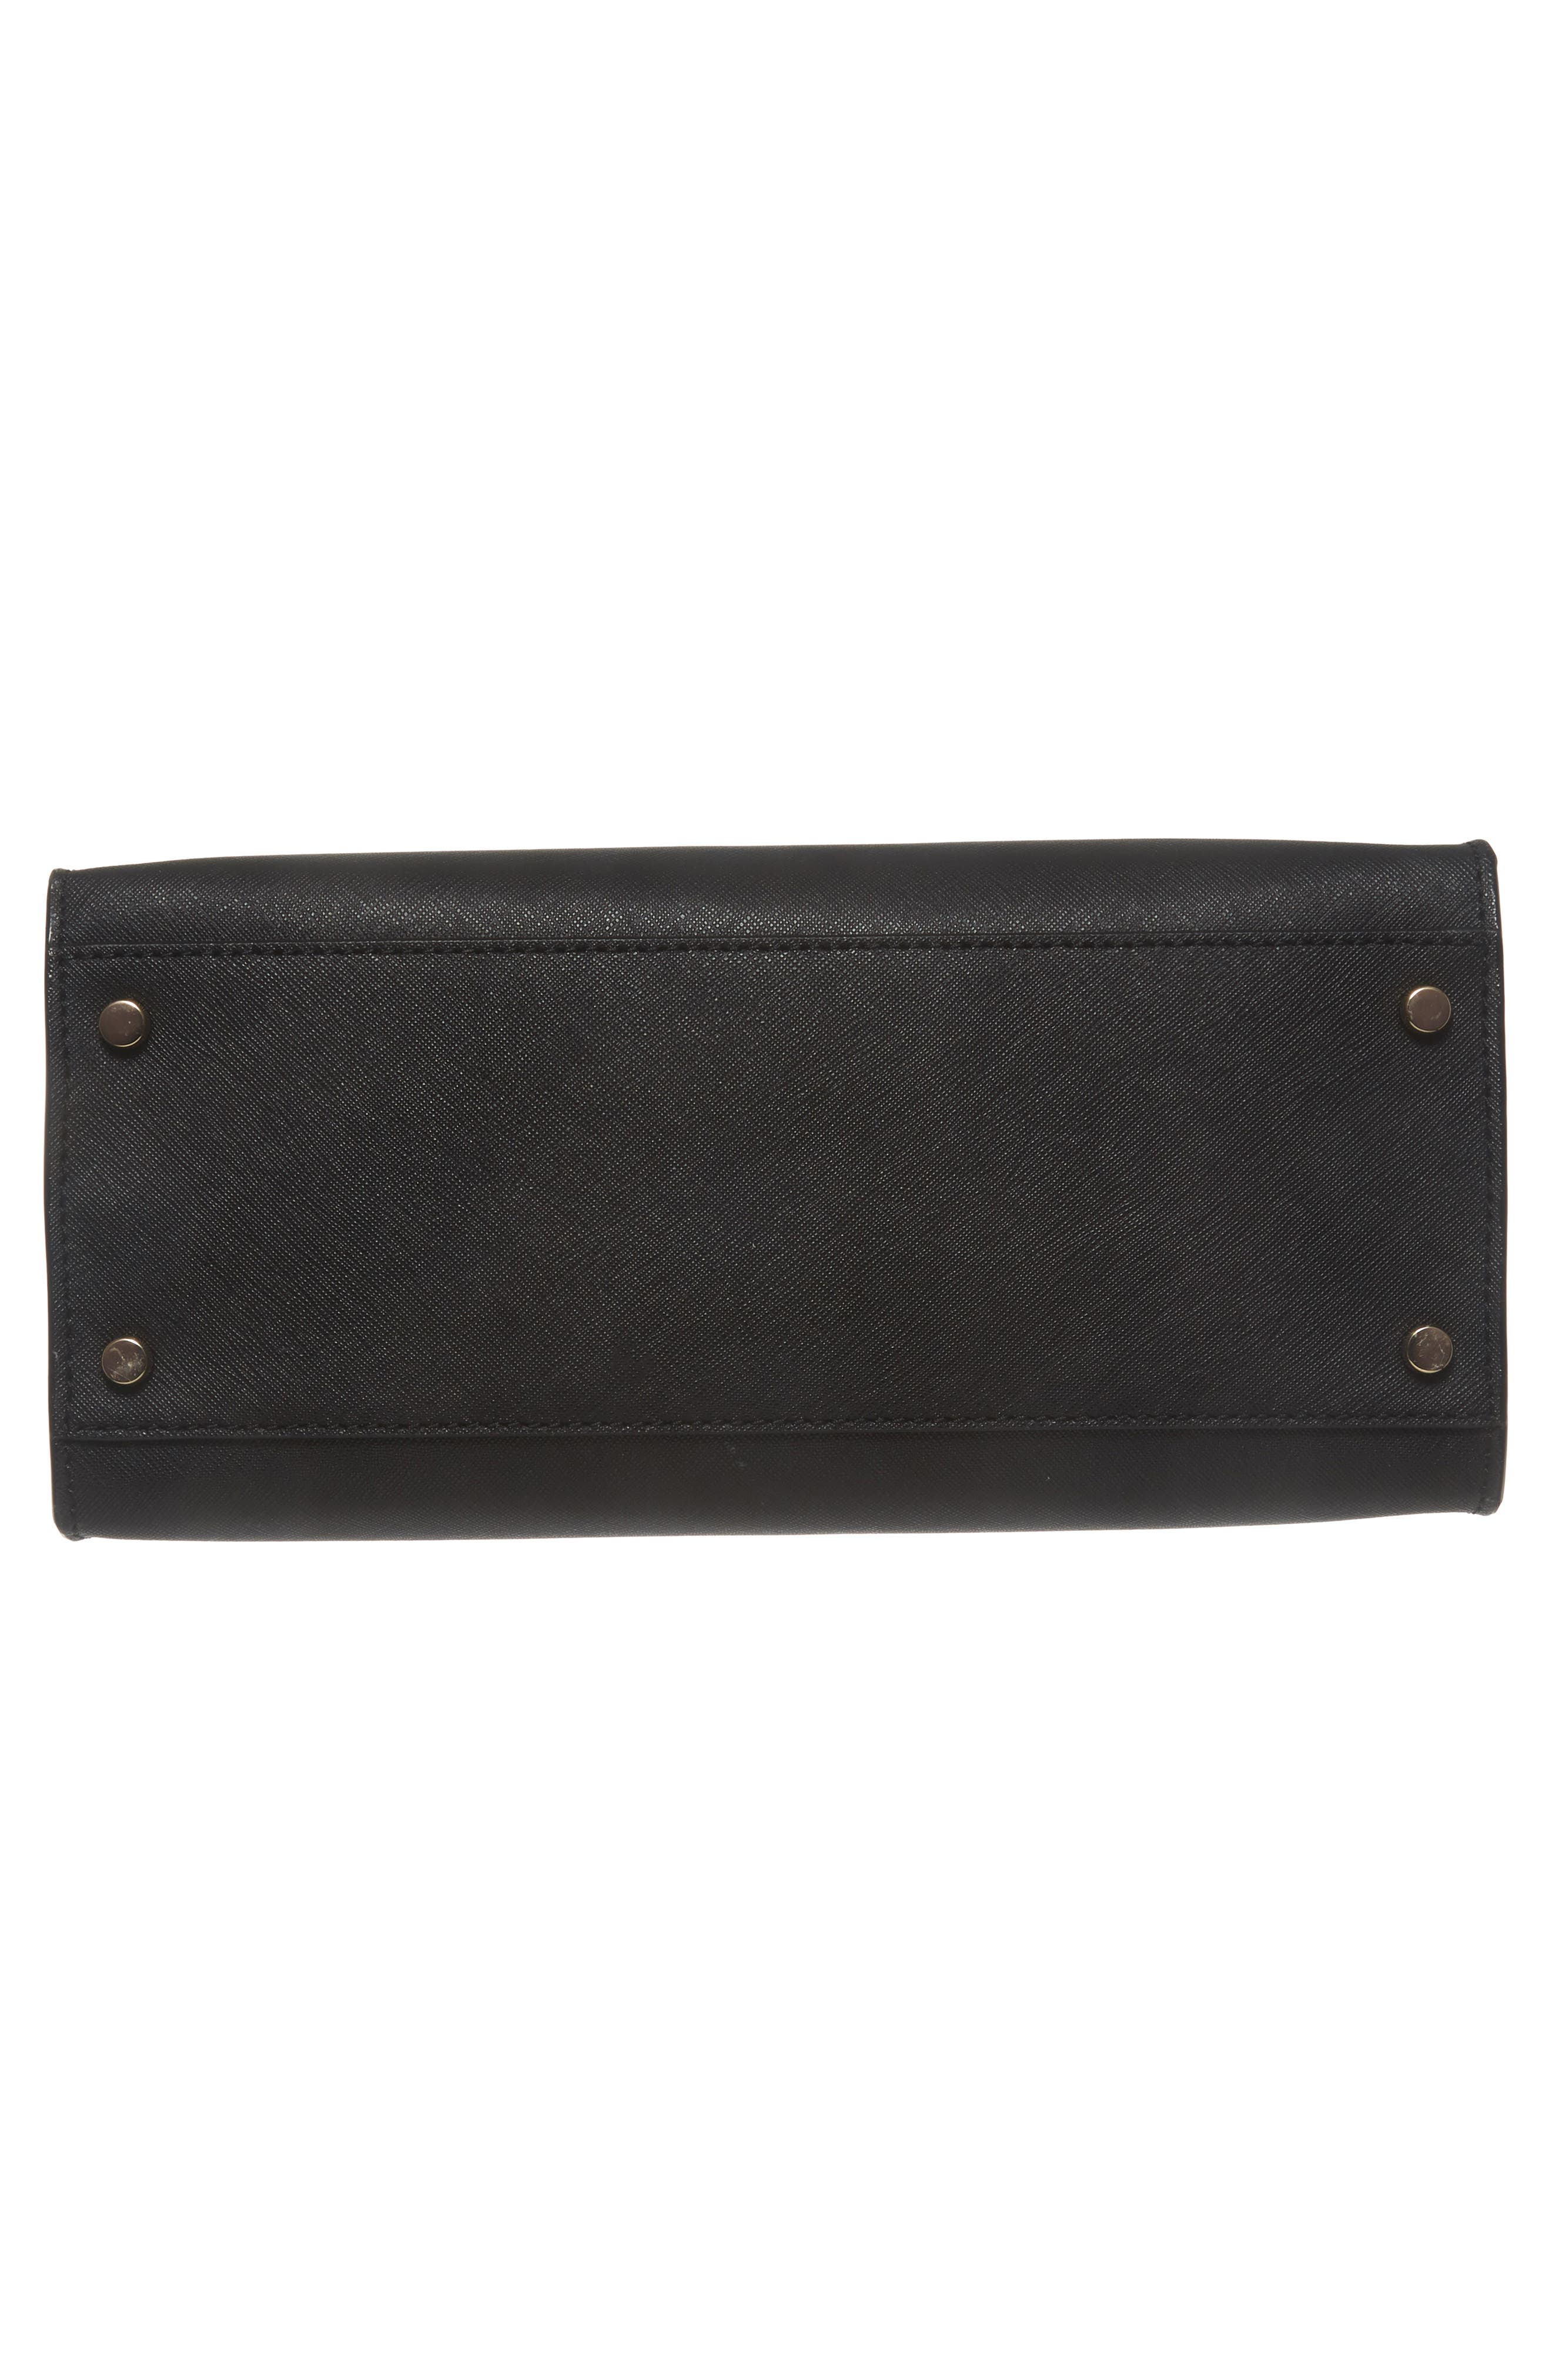 cameron street - sara leather satchel,                             Alternate thumbnail 6, color,                             001